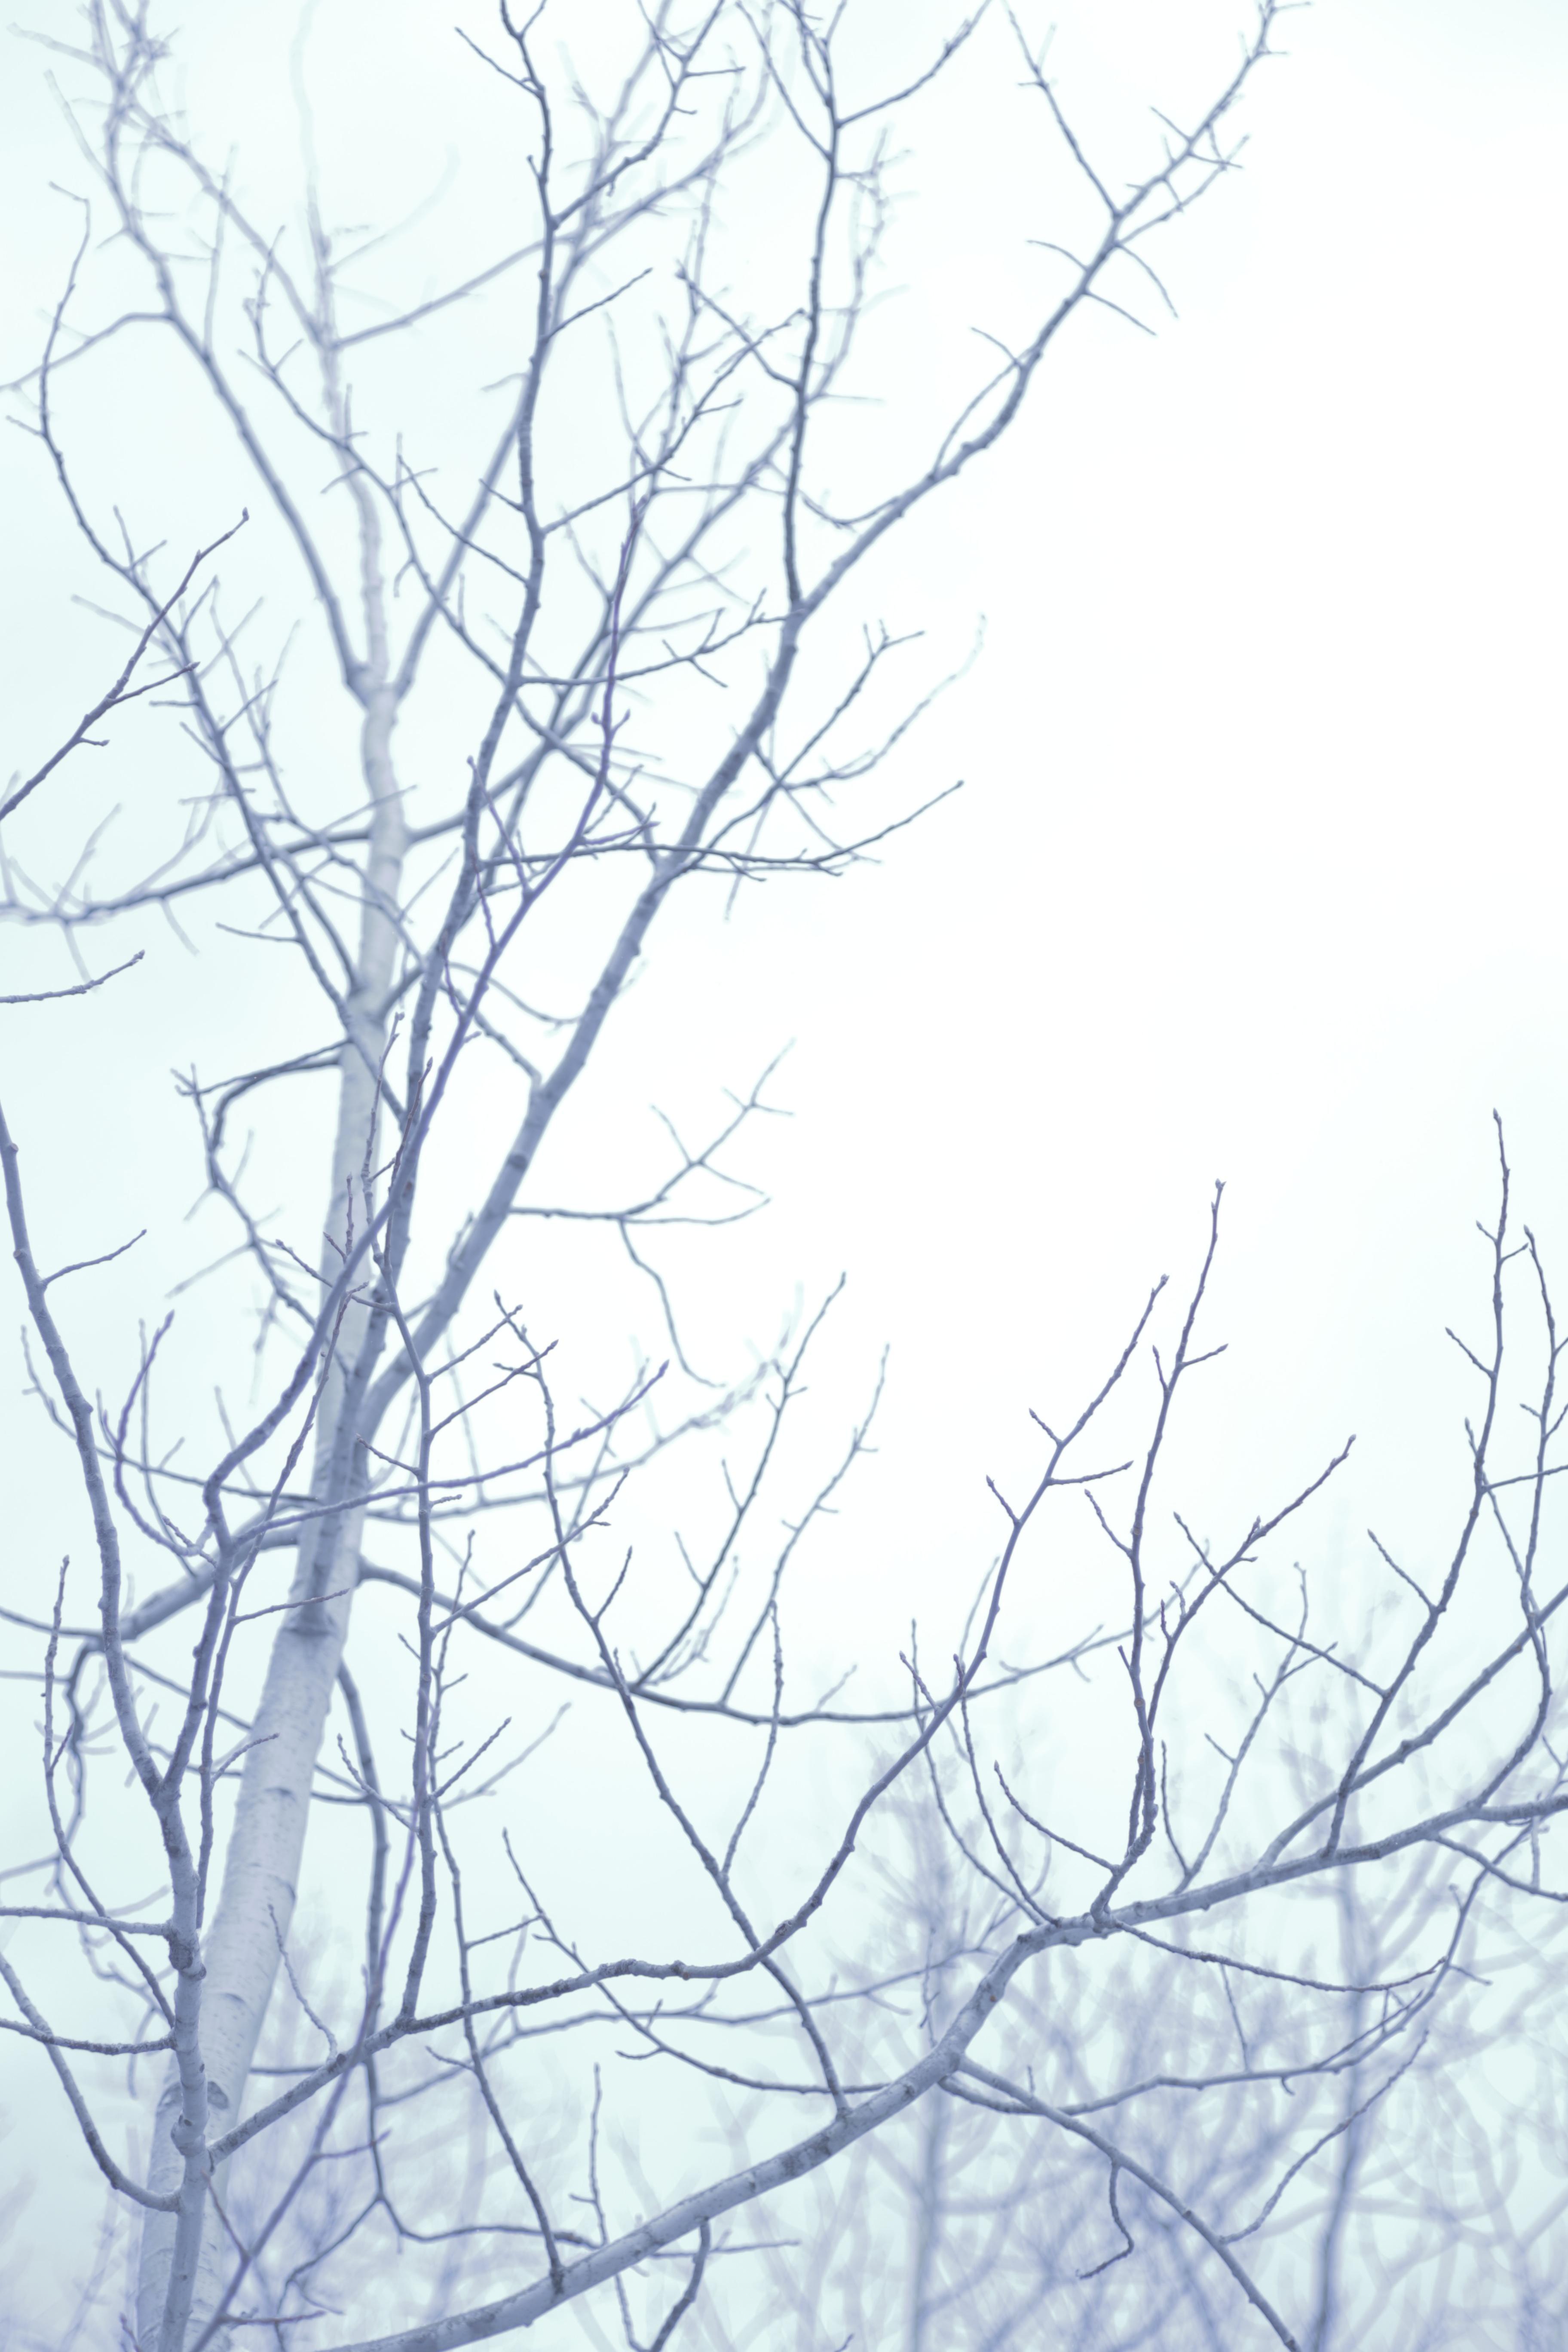 Gambar Pohon Cabang Ranting Sketsa Gambar Garis Seni